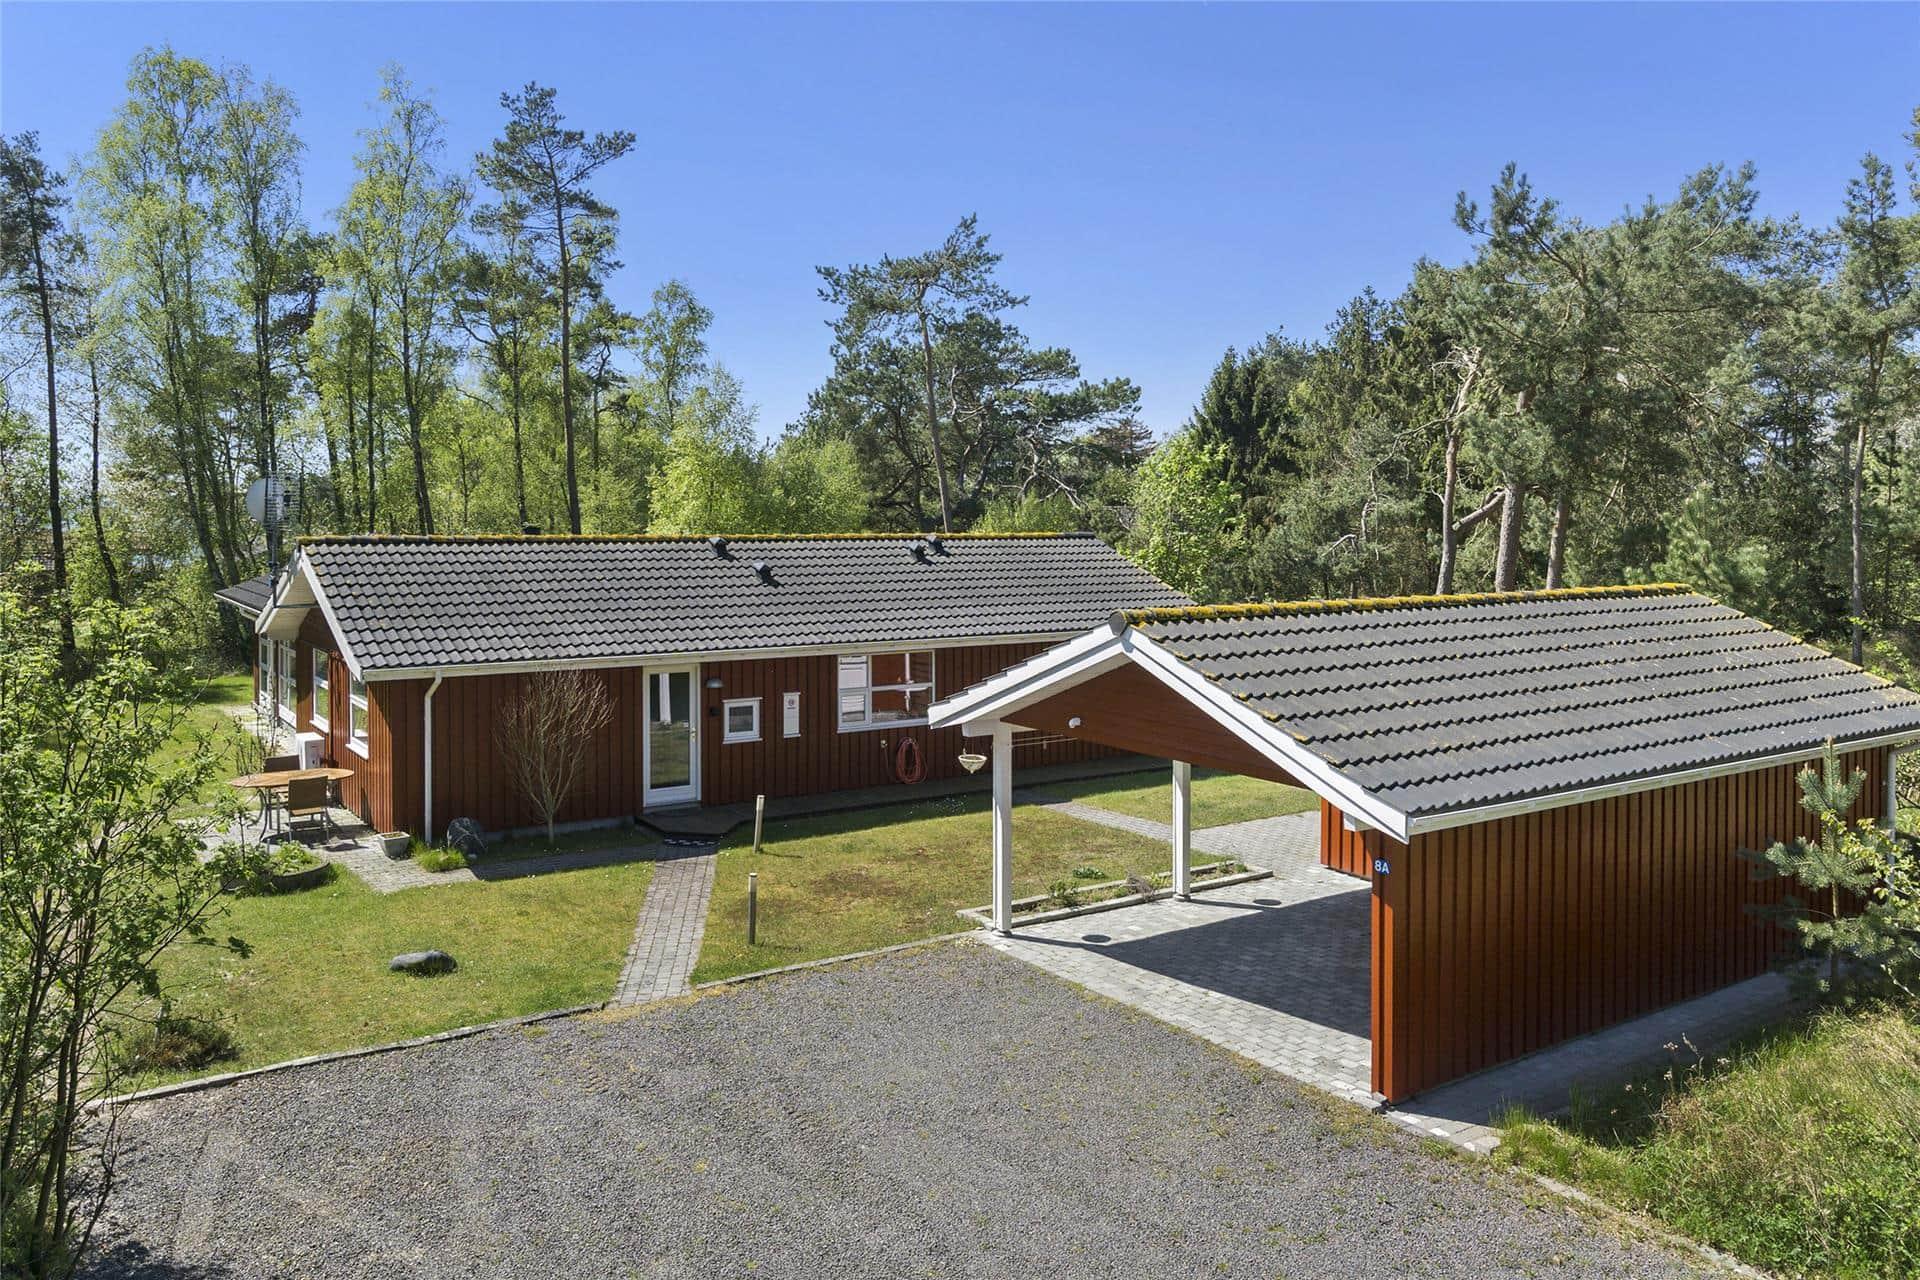 Bilde 1-10 Feirehus 1505, Sluseparken 8, DK - 3720 Aakirkeby